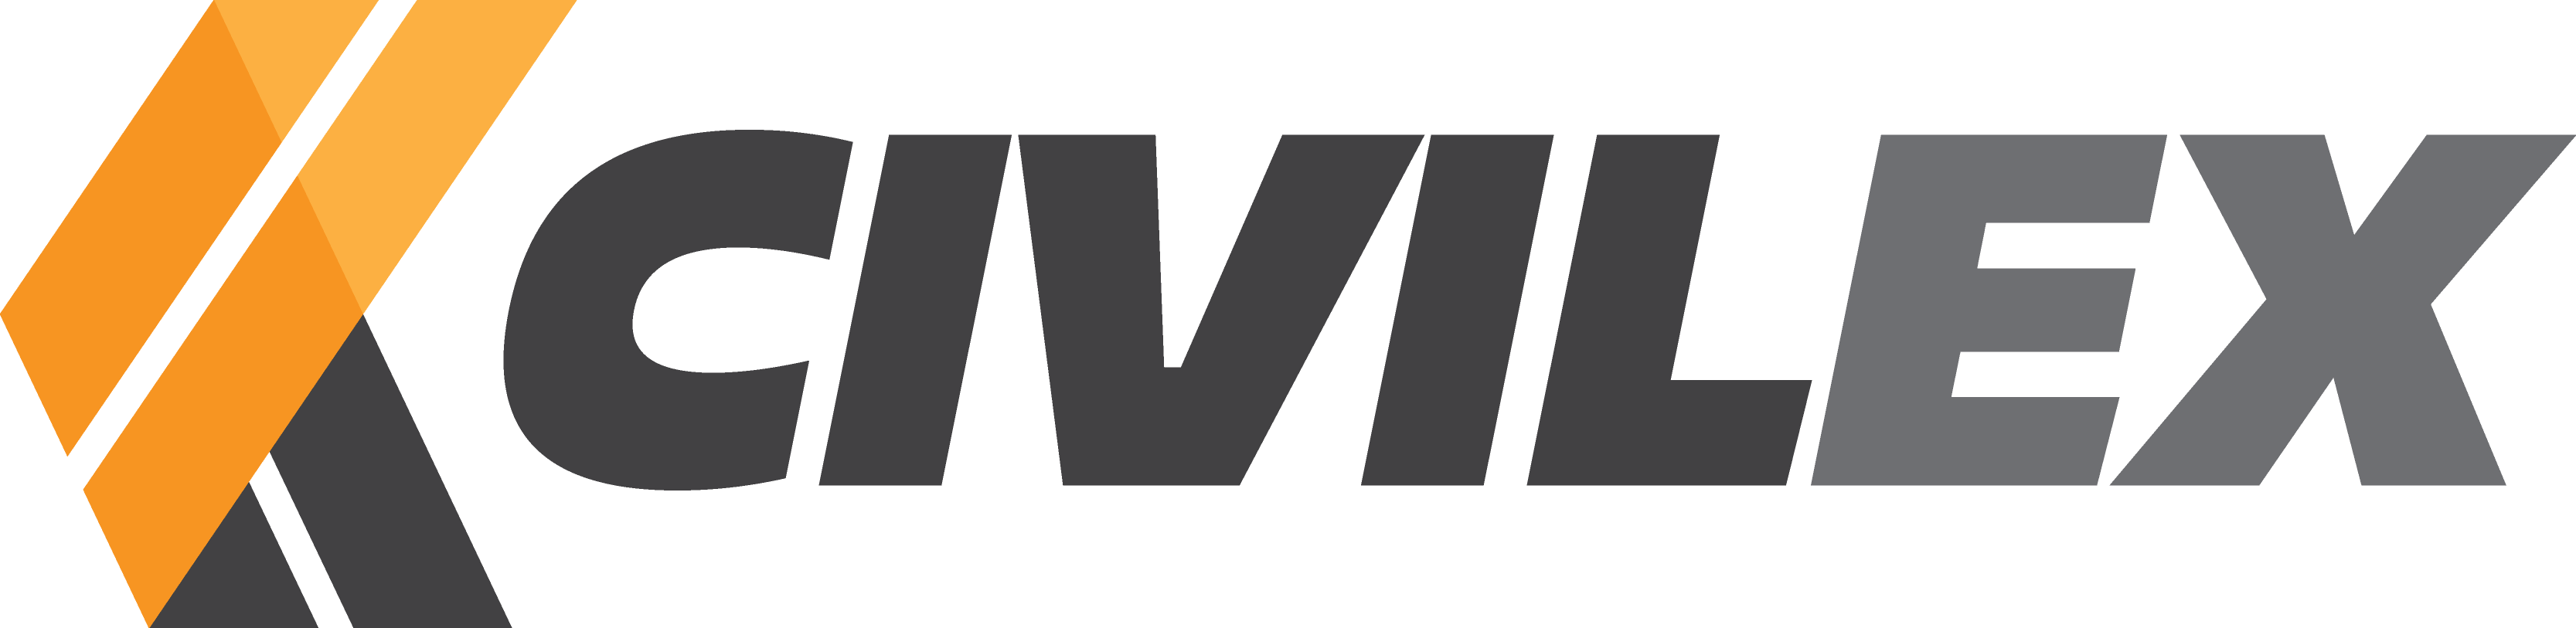 Civilex-Brand